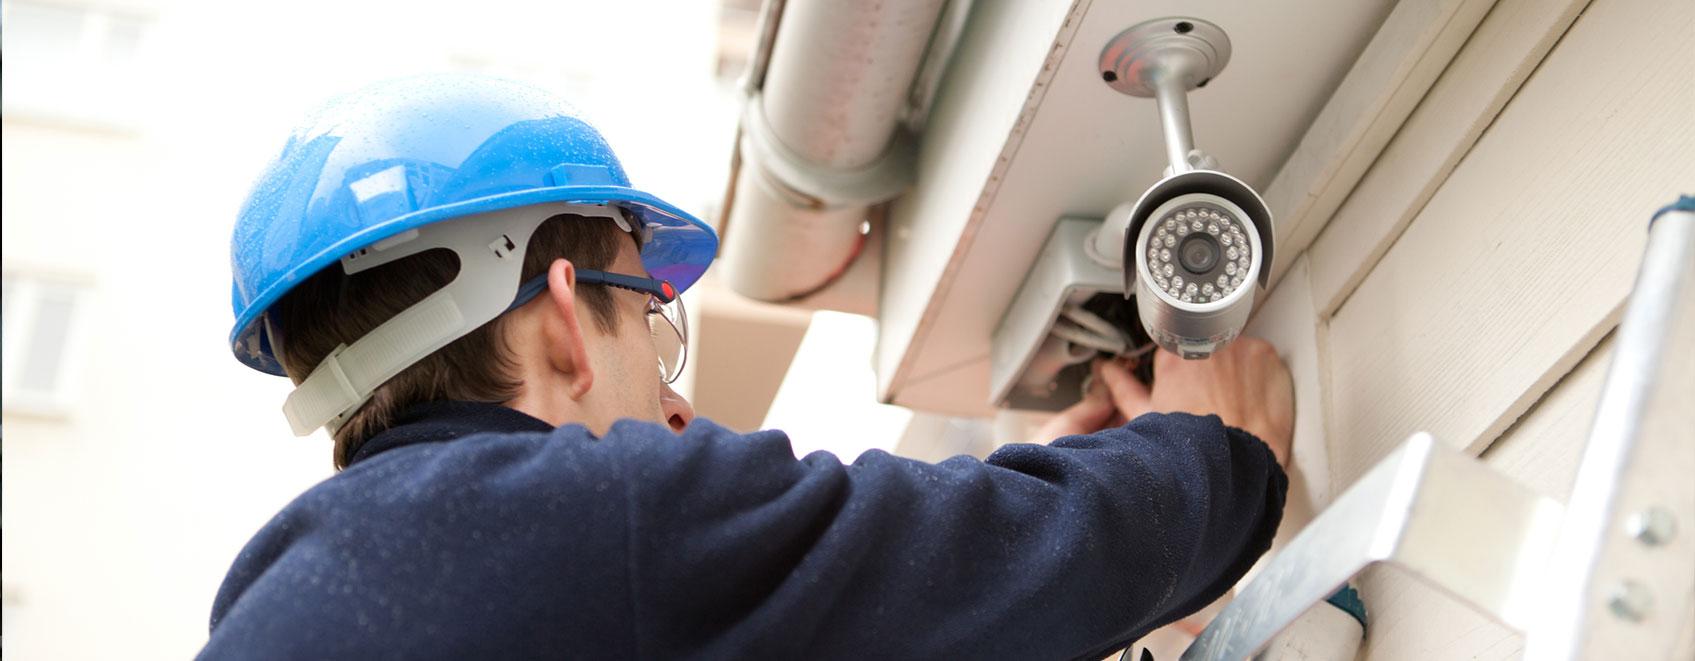 Technician installing security camera